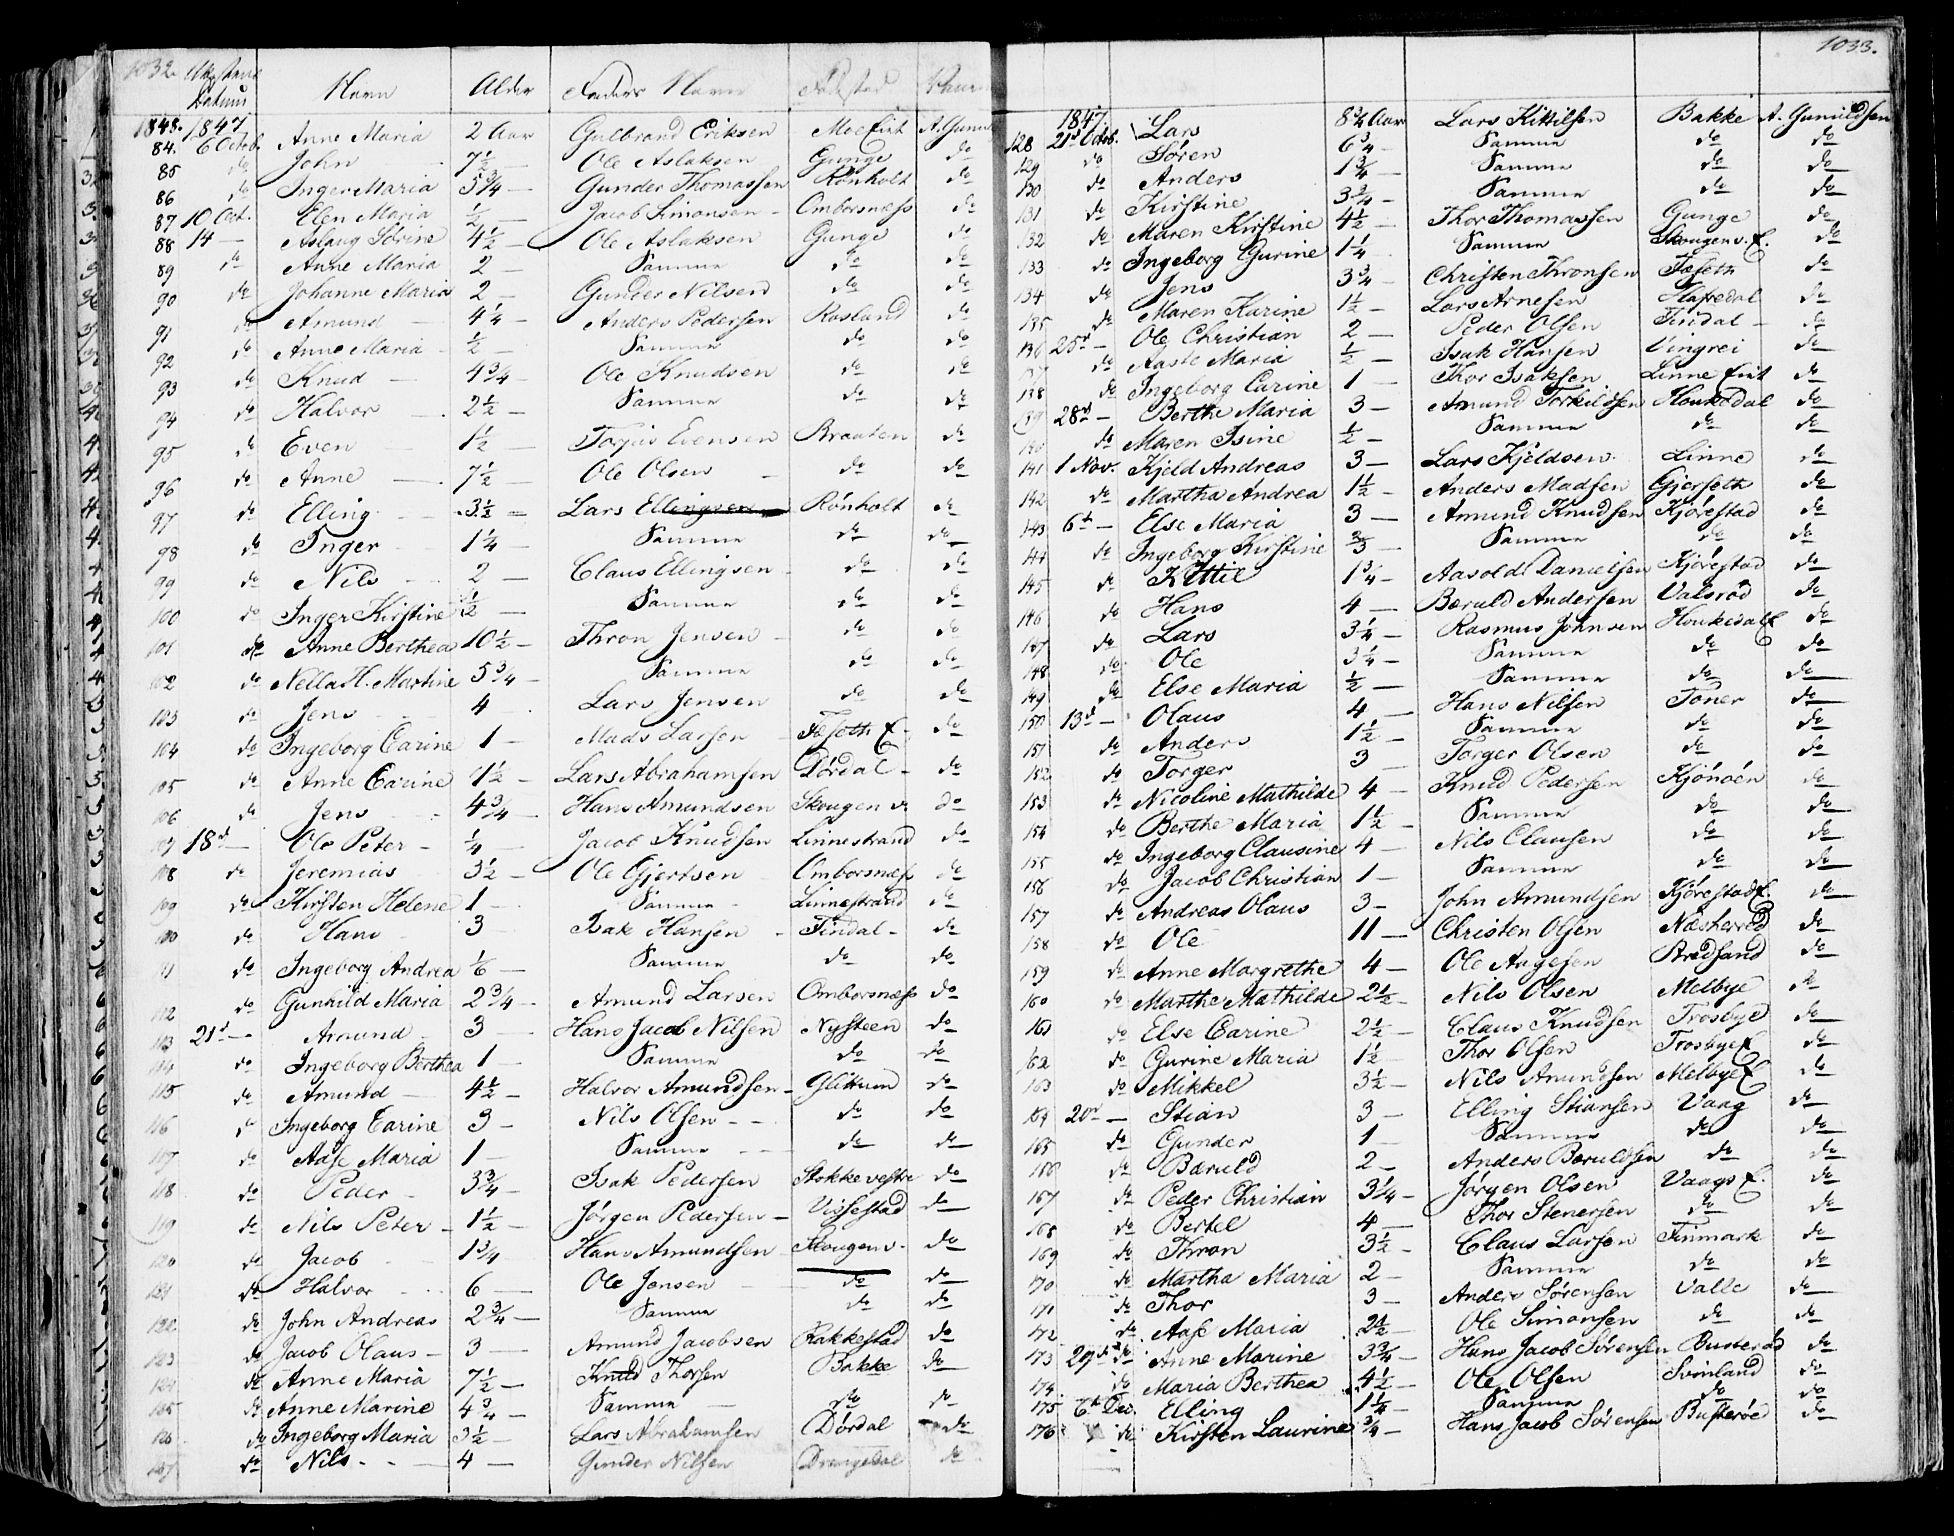 SAKO, Bamble kirkebøker, F/Fa/L0004: Ministerialbok nr. I 4, 1834-1853, s. 1032-1033